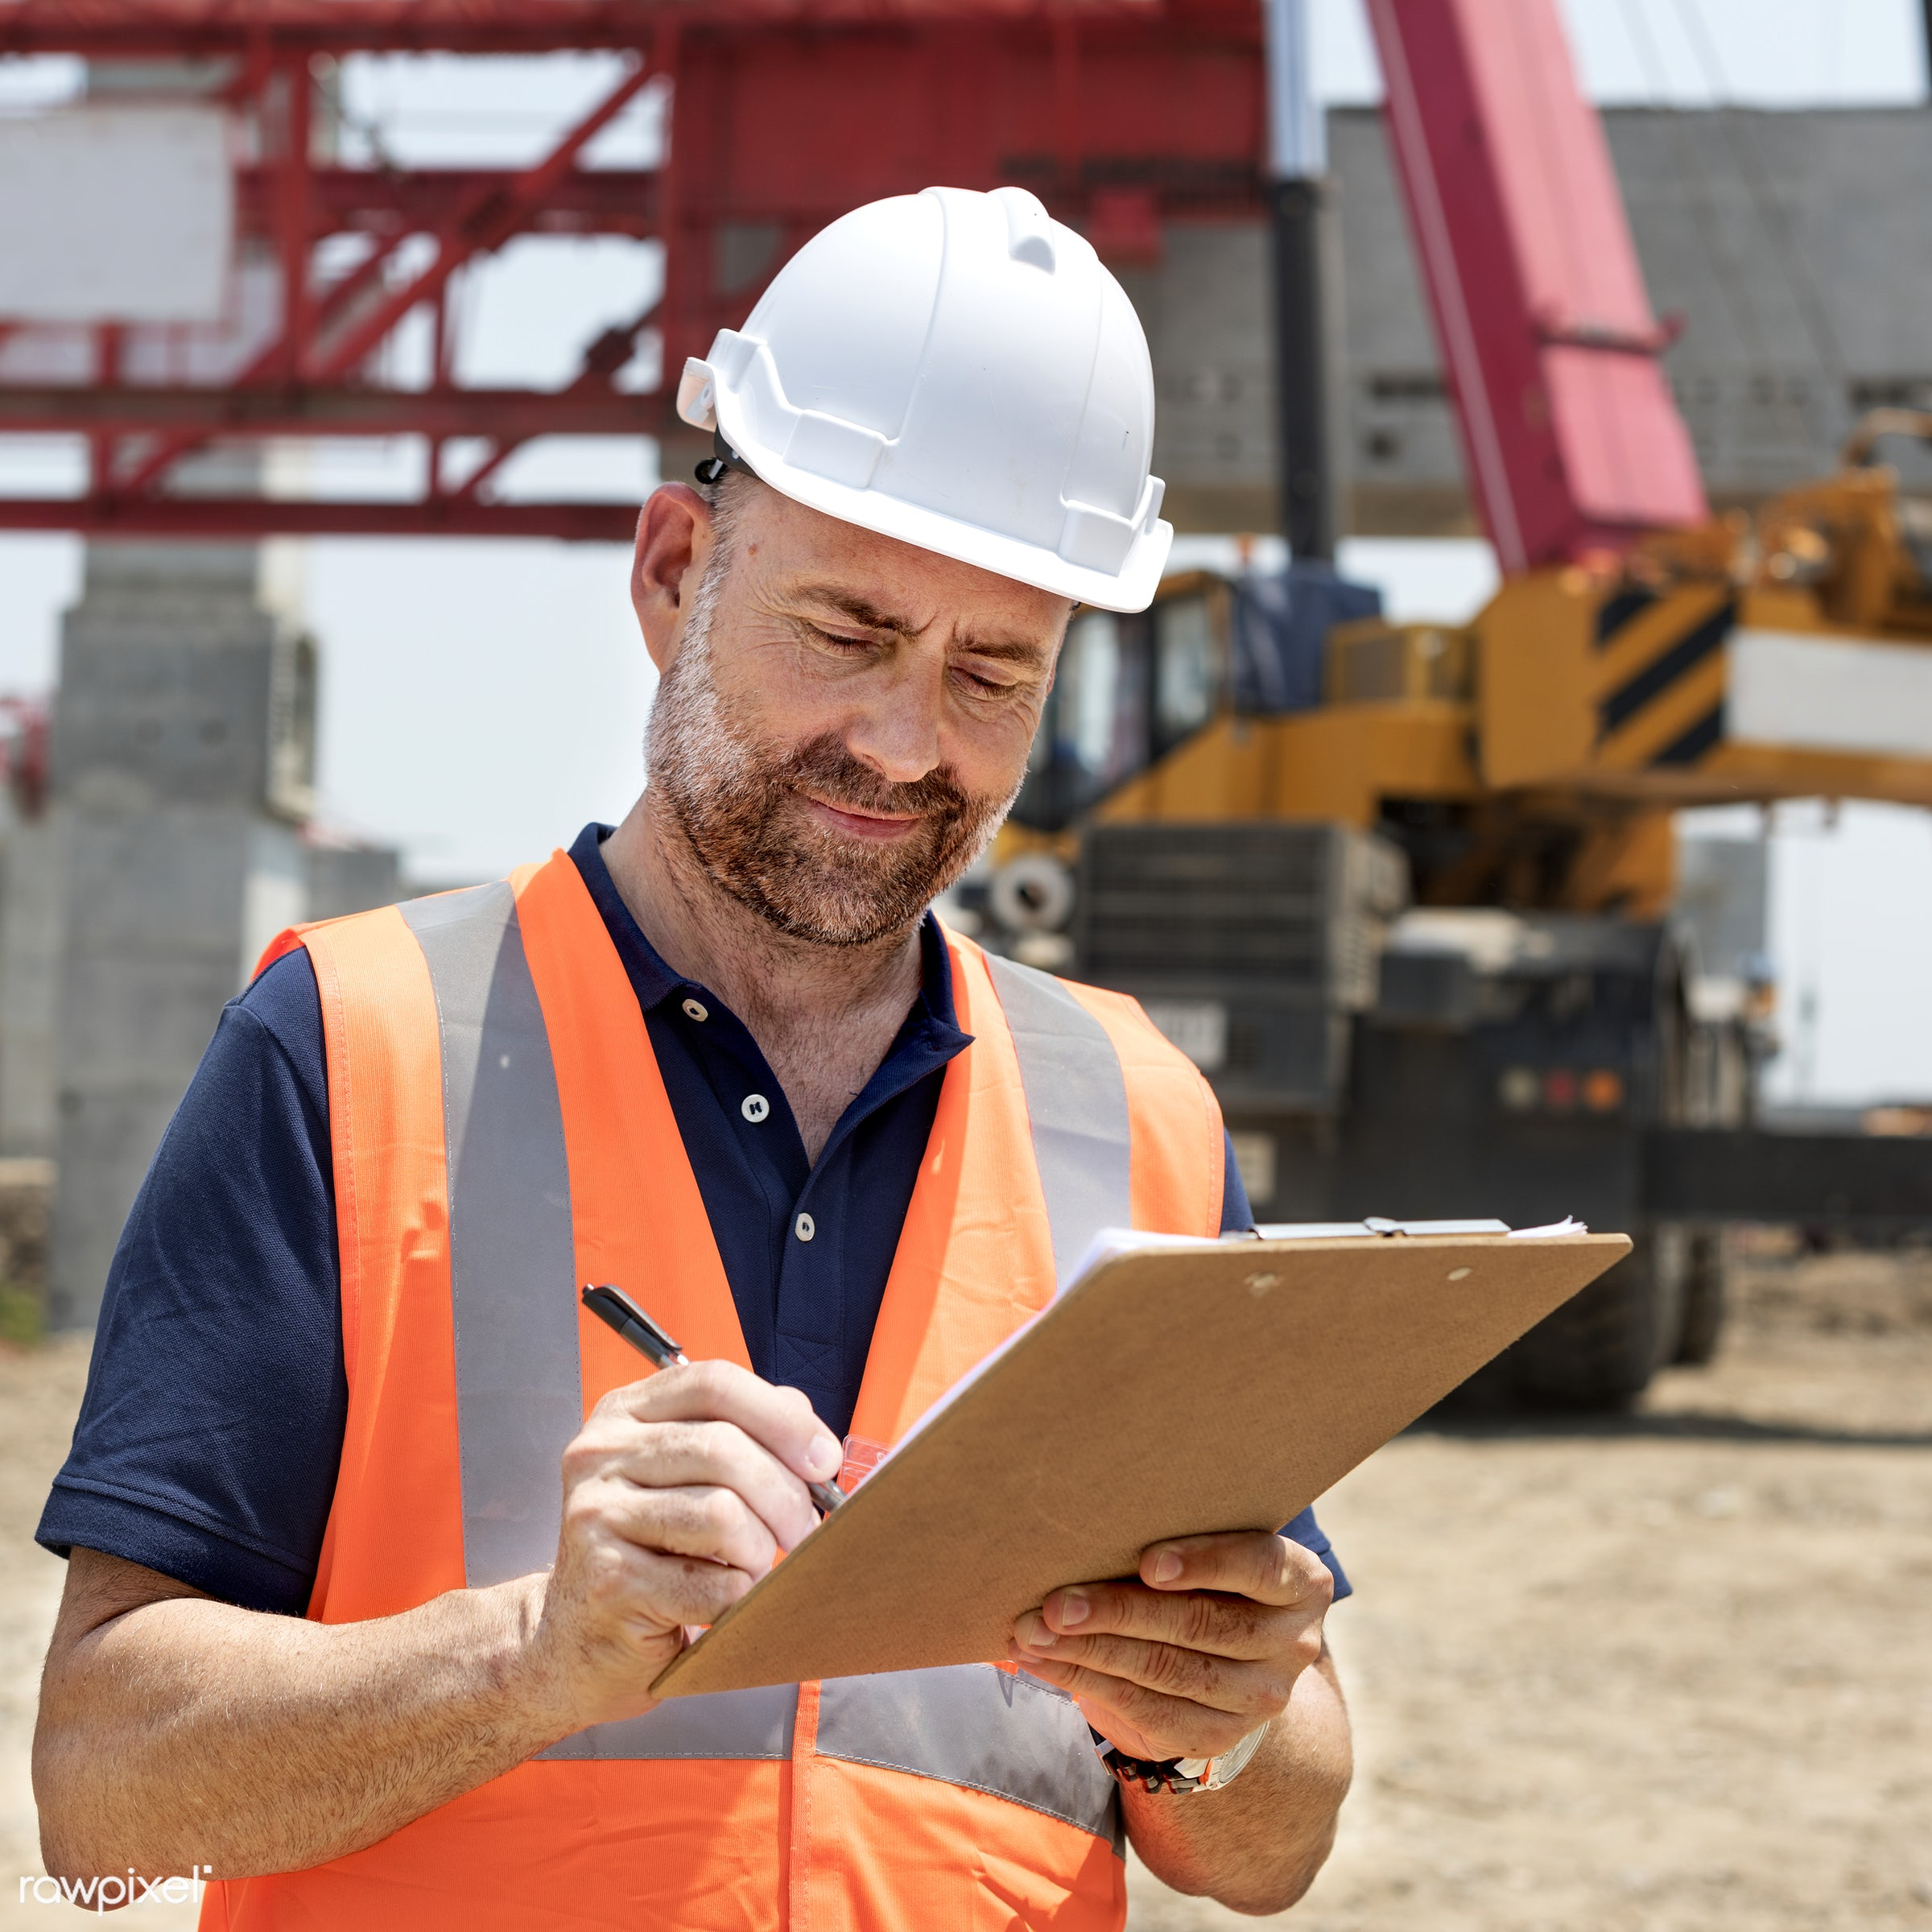 architecture, blueprint, board, building, built, career, check, clipboard, construction, construction site, control,...